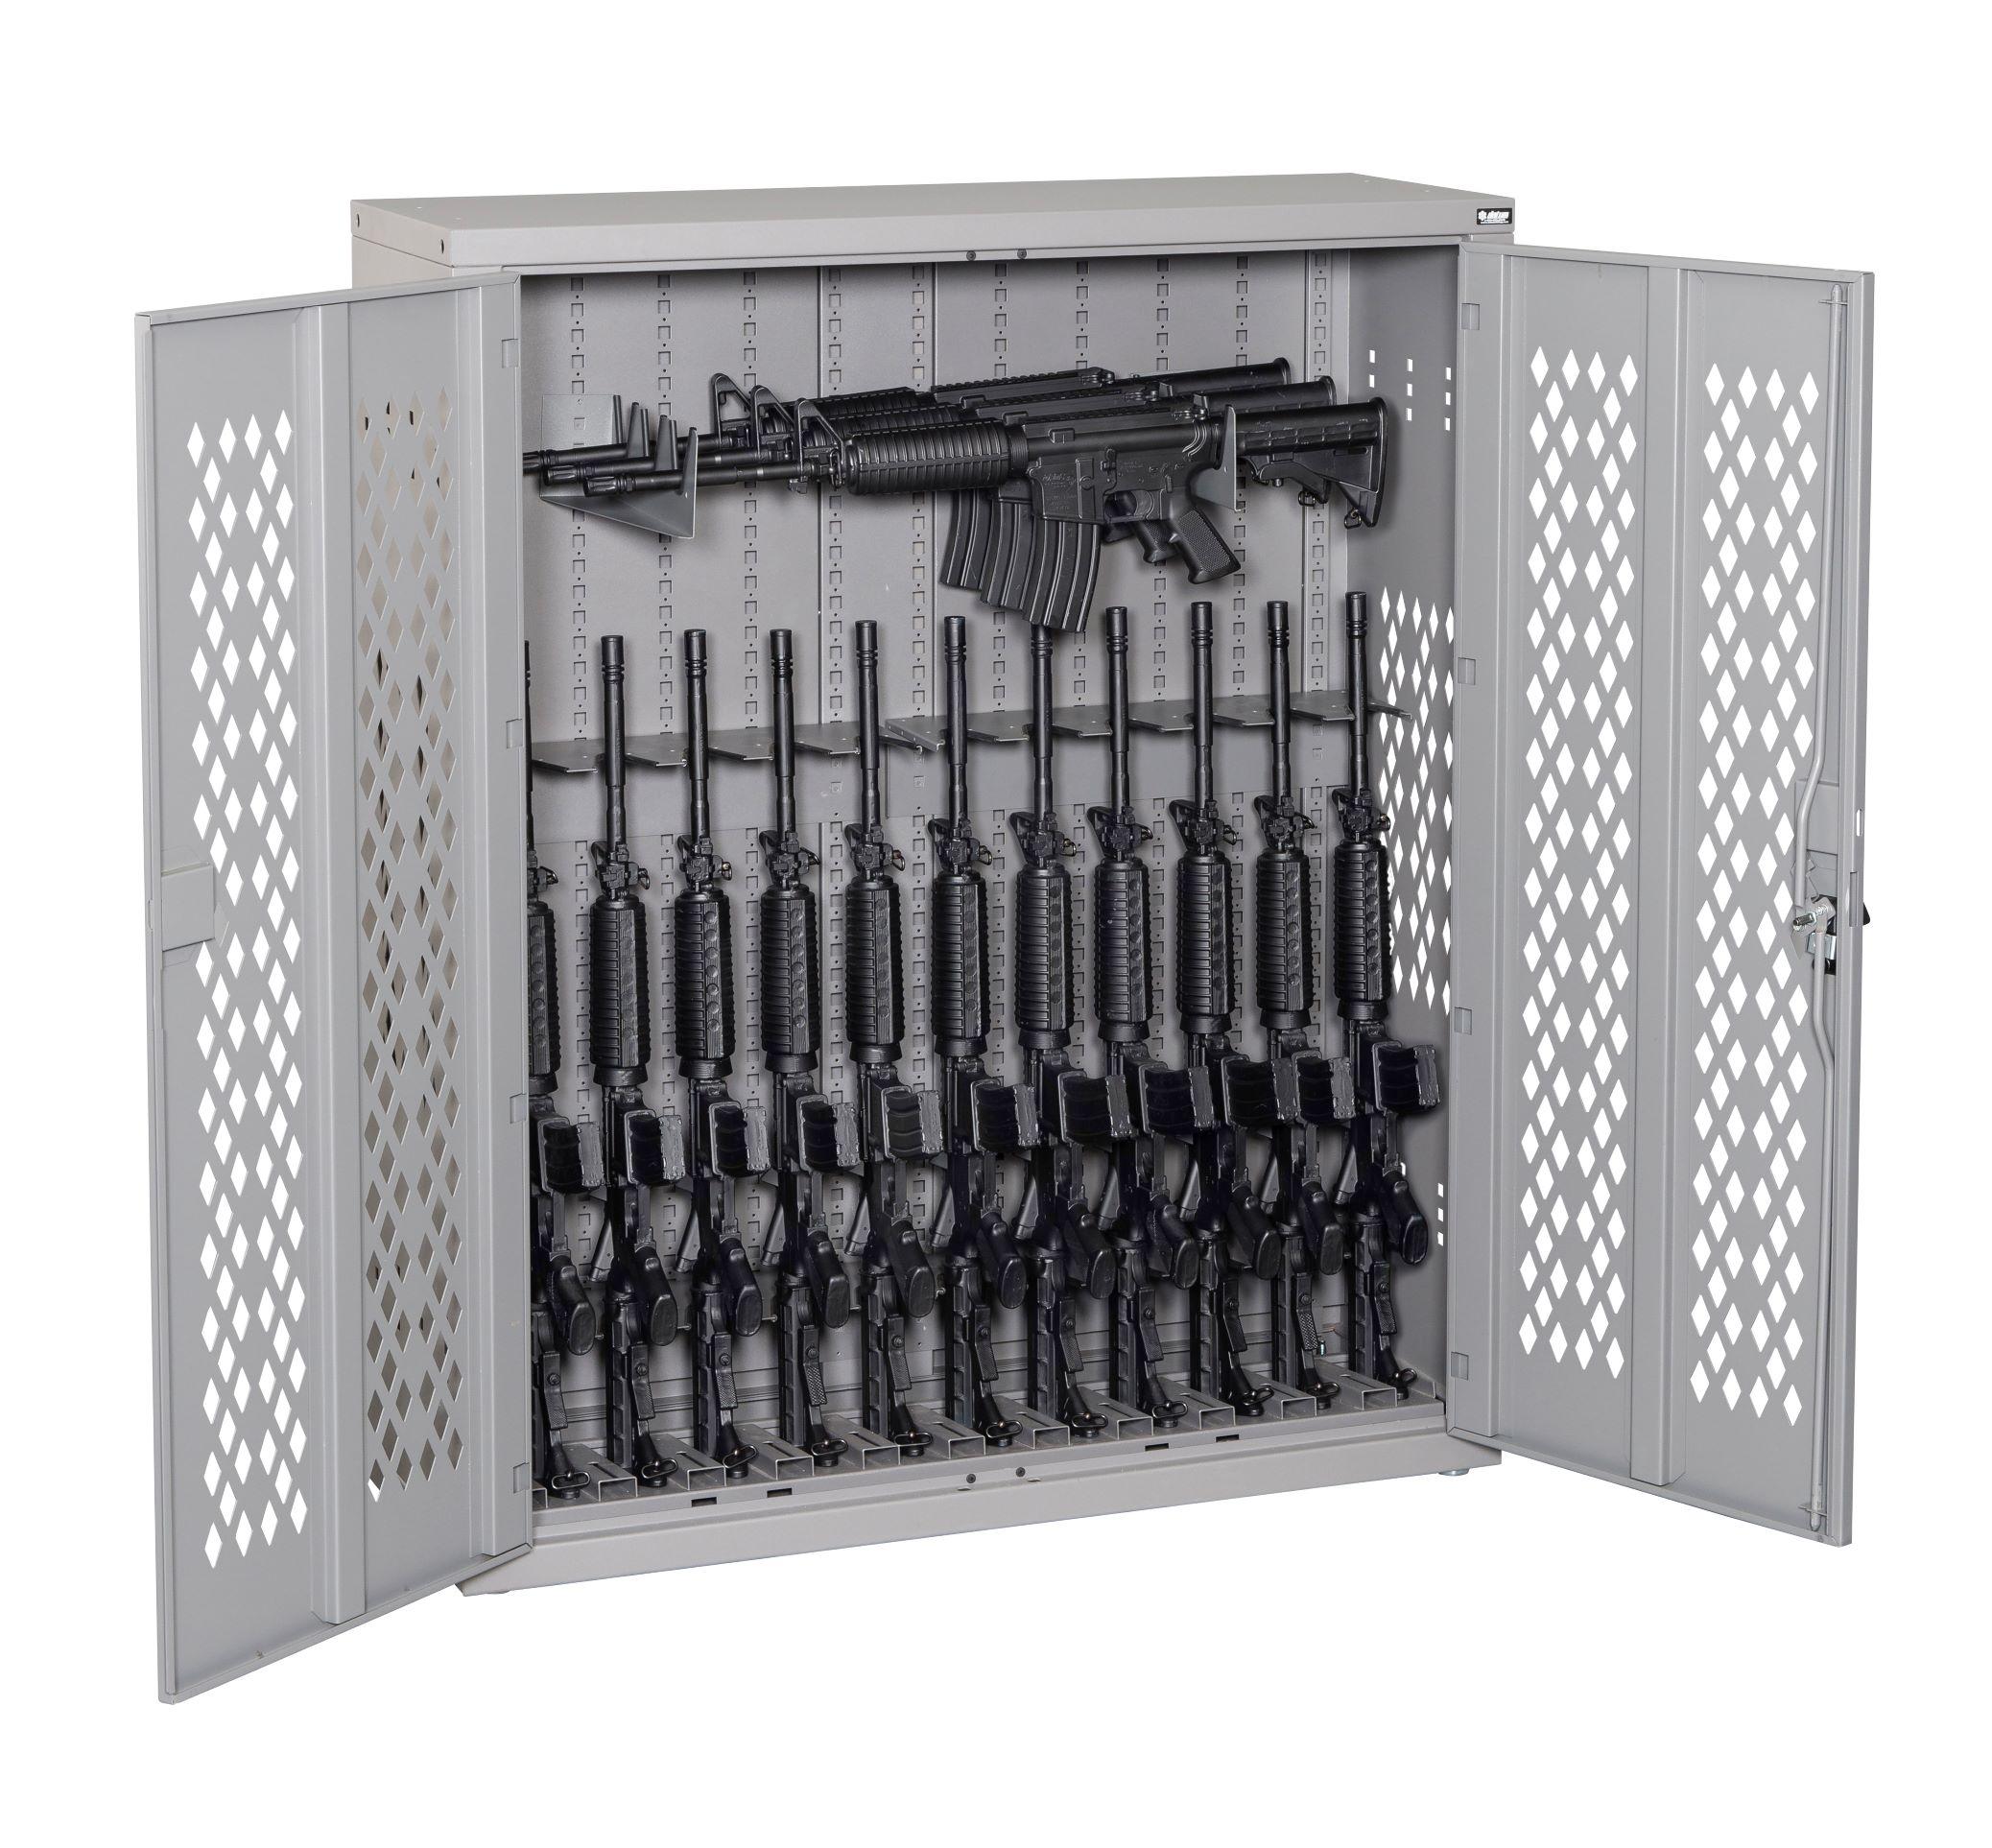 weapons racks and storage ISDA Storage